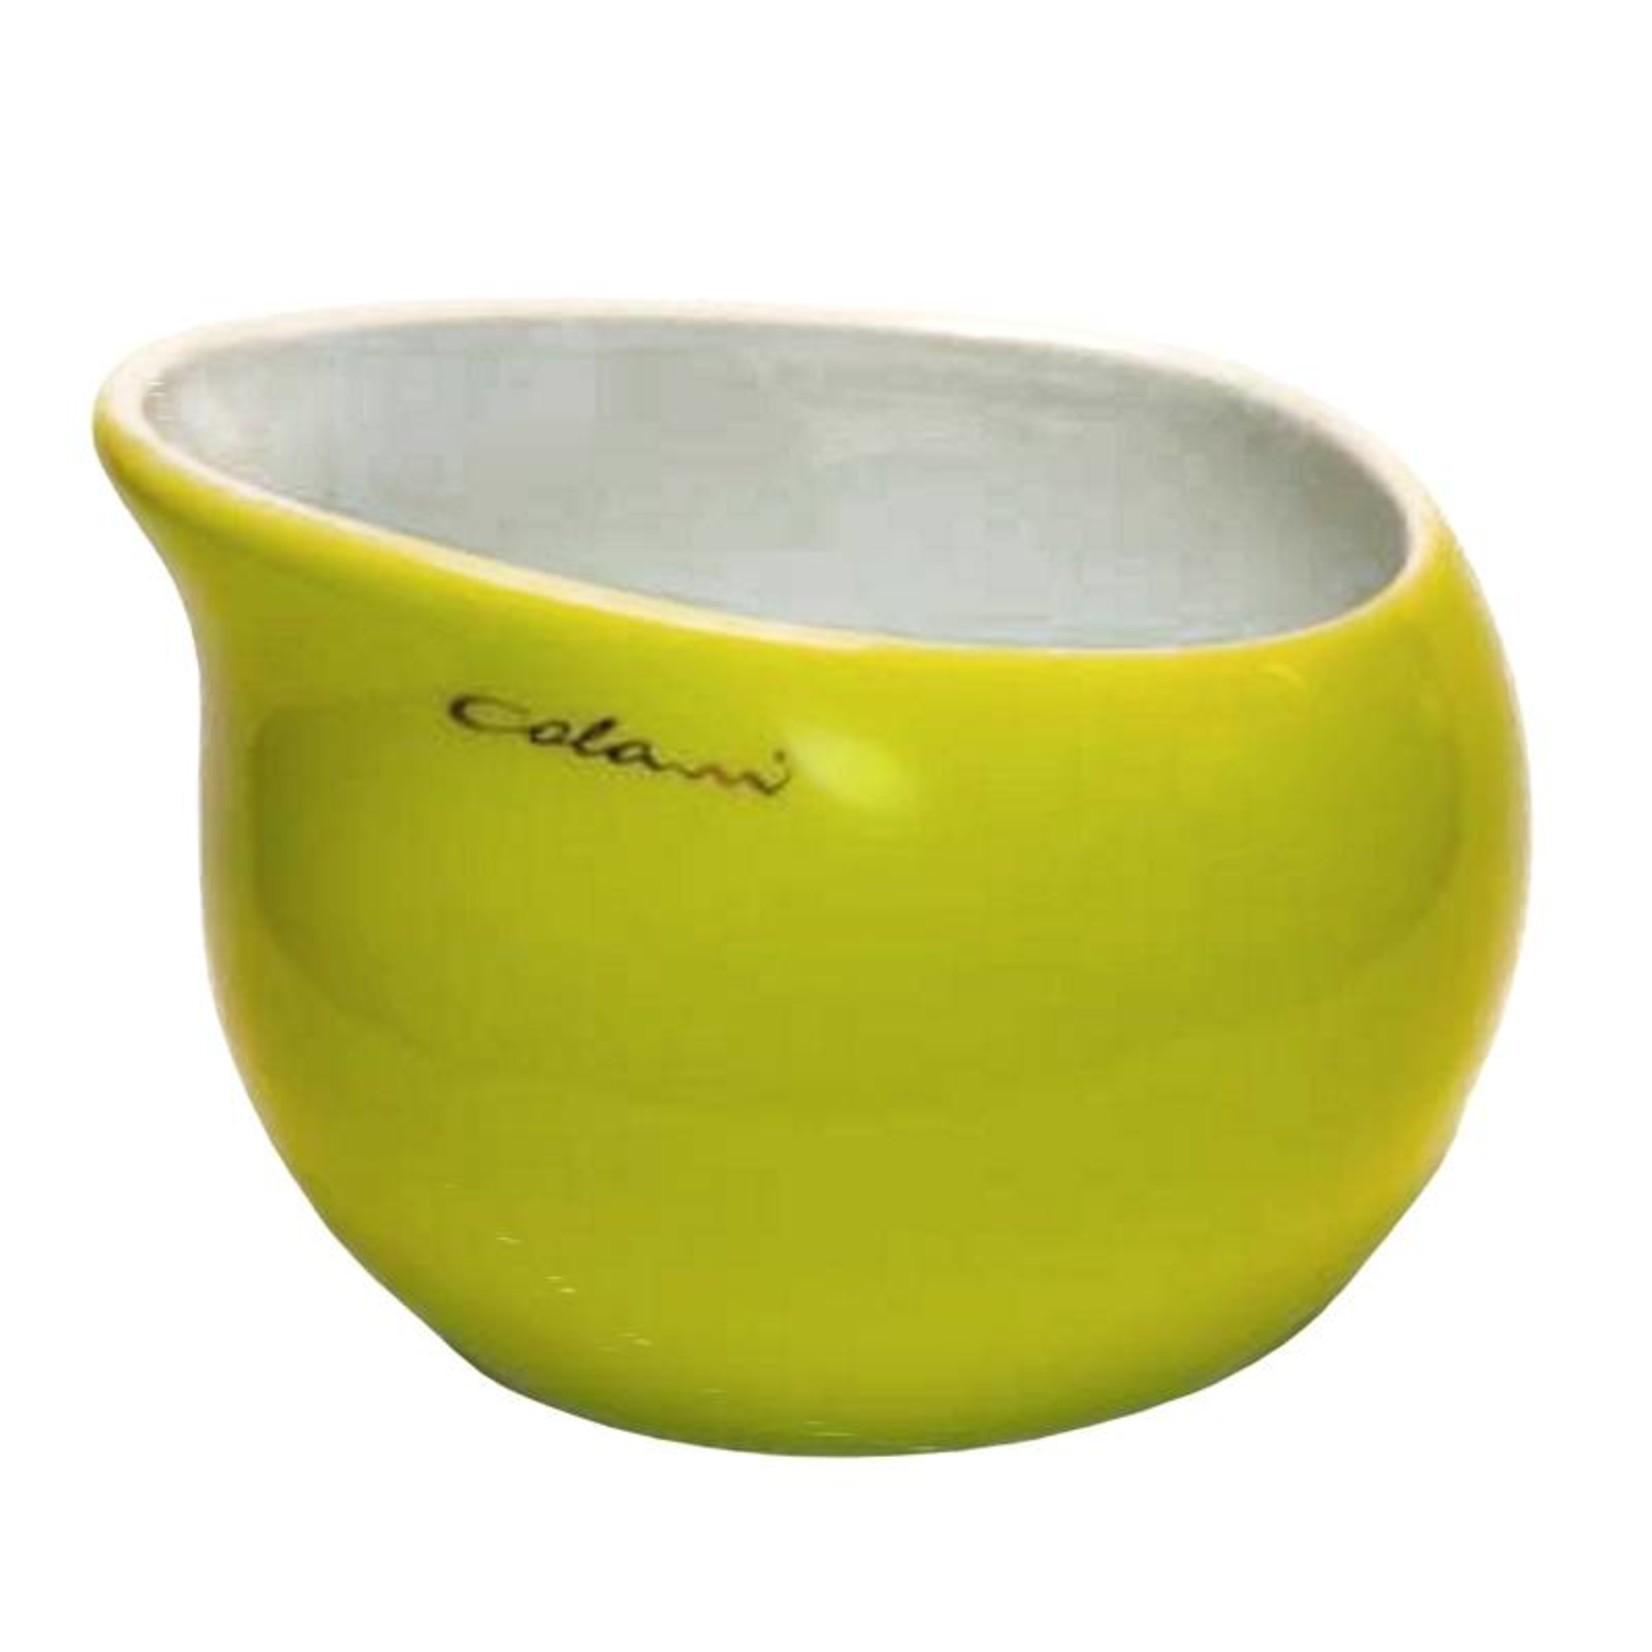 Colani Porzellanserie Colani Zuckerschale I grün I Zuckergefäß I Porzellan